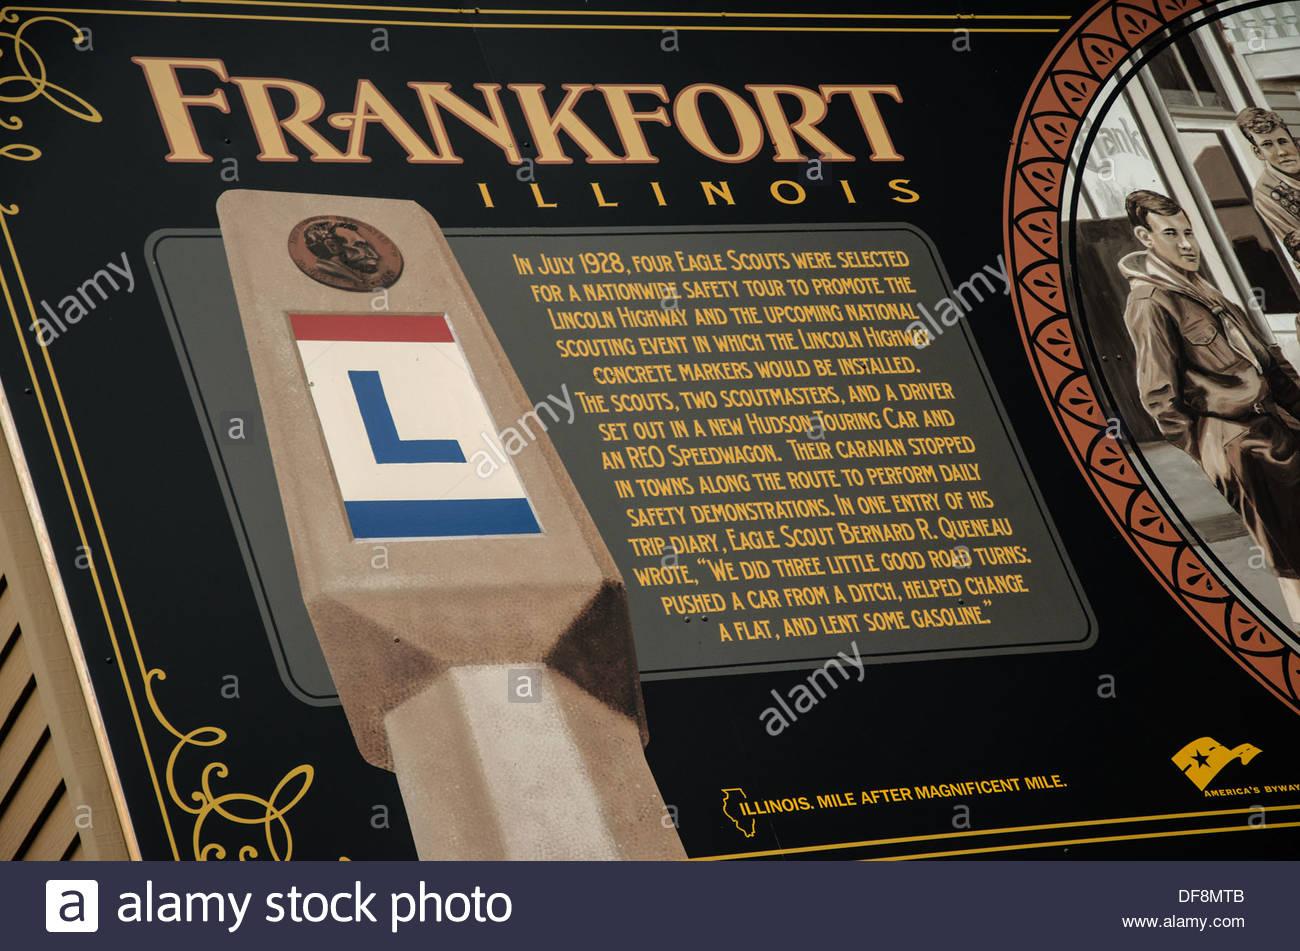 Lincoln Highway Interpretive Mural  in Frankfort Illinois - Stock Image